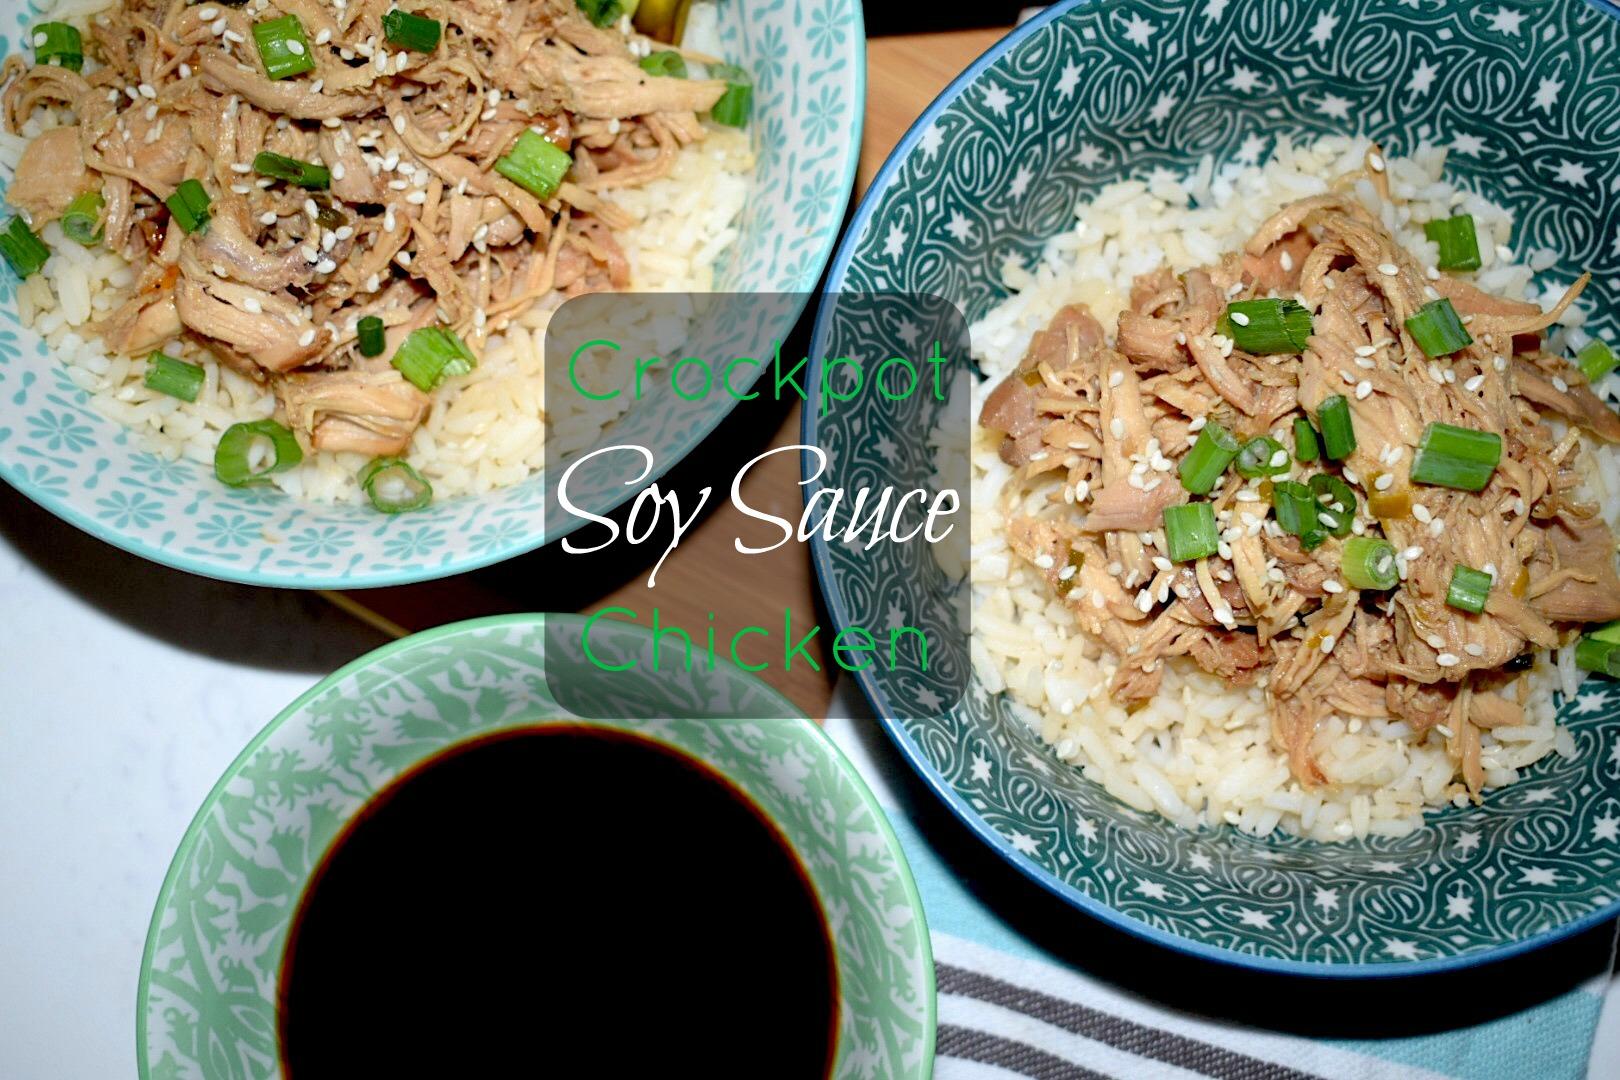 Crockpot Soy Sauce Chicken